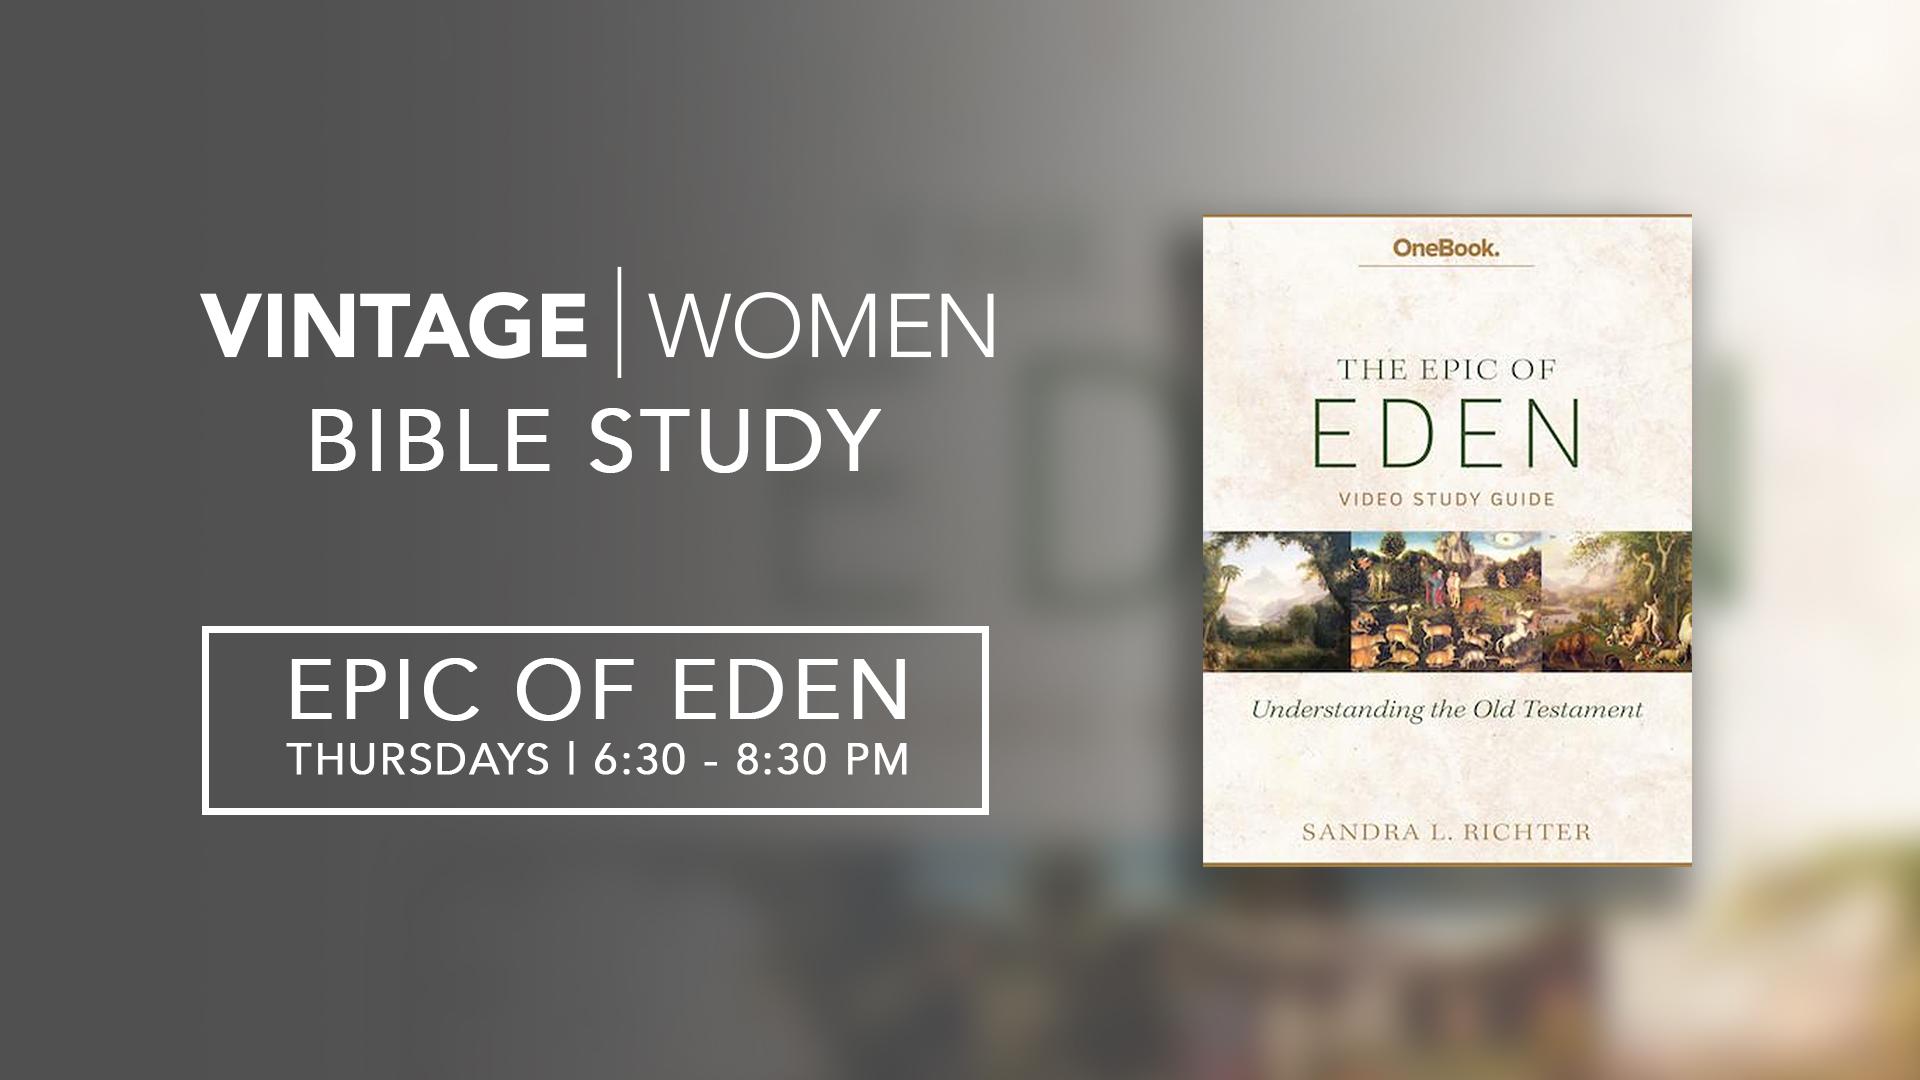 BibleStudy_EpicofEden.jpg